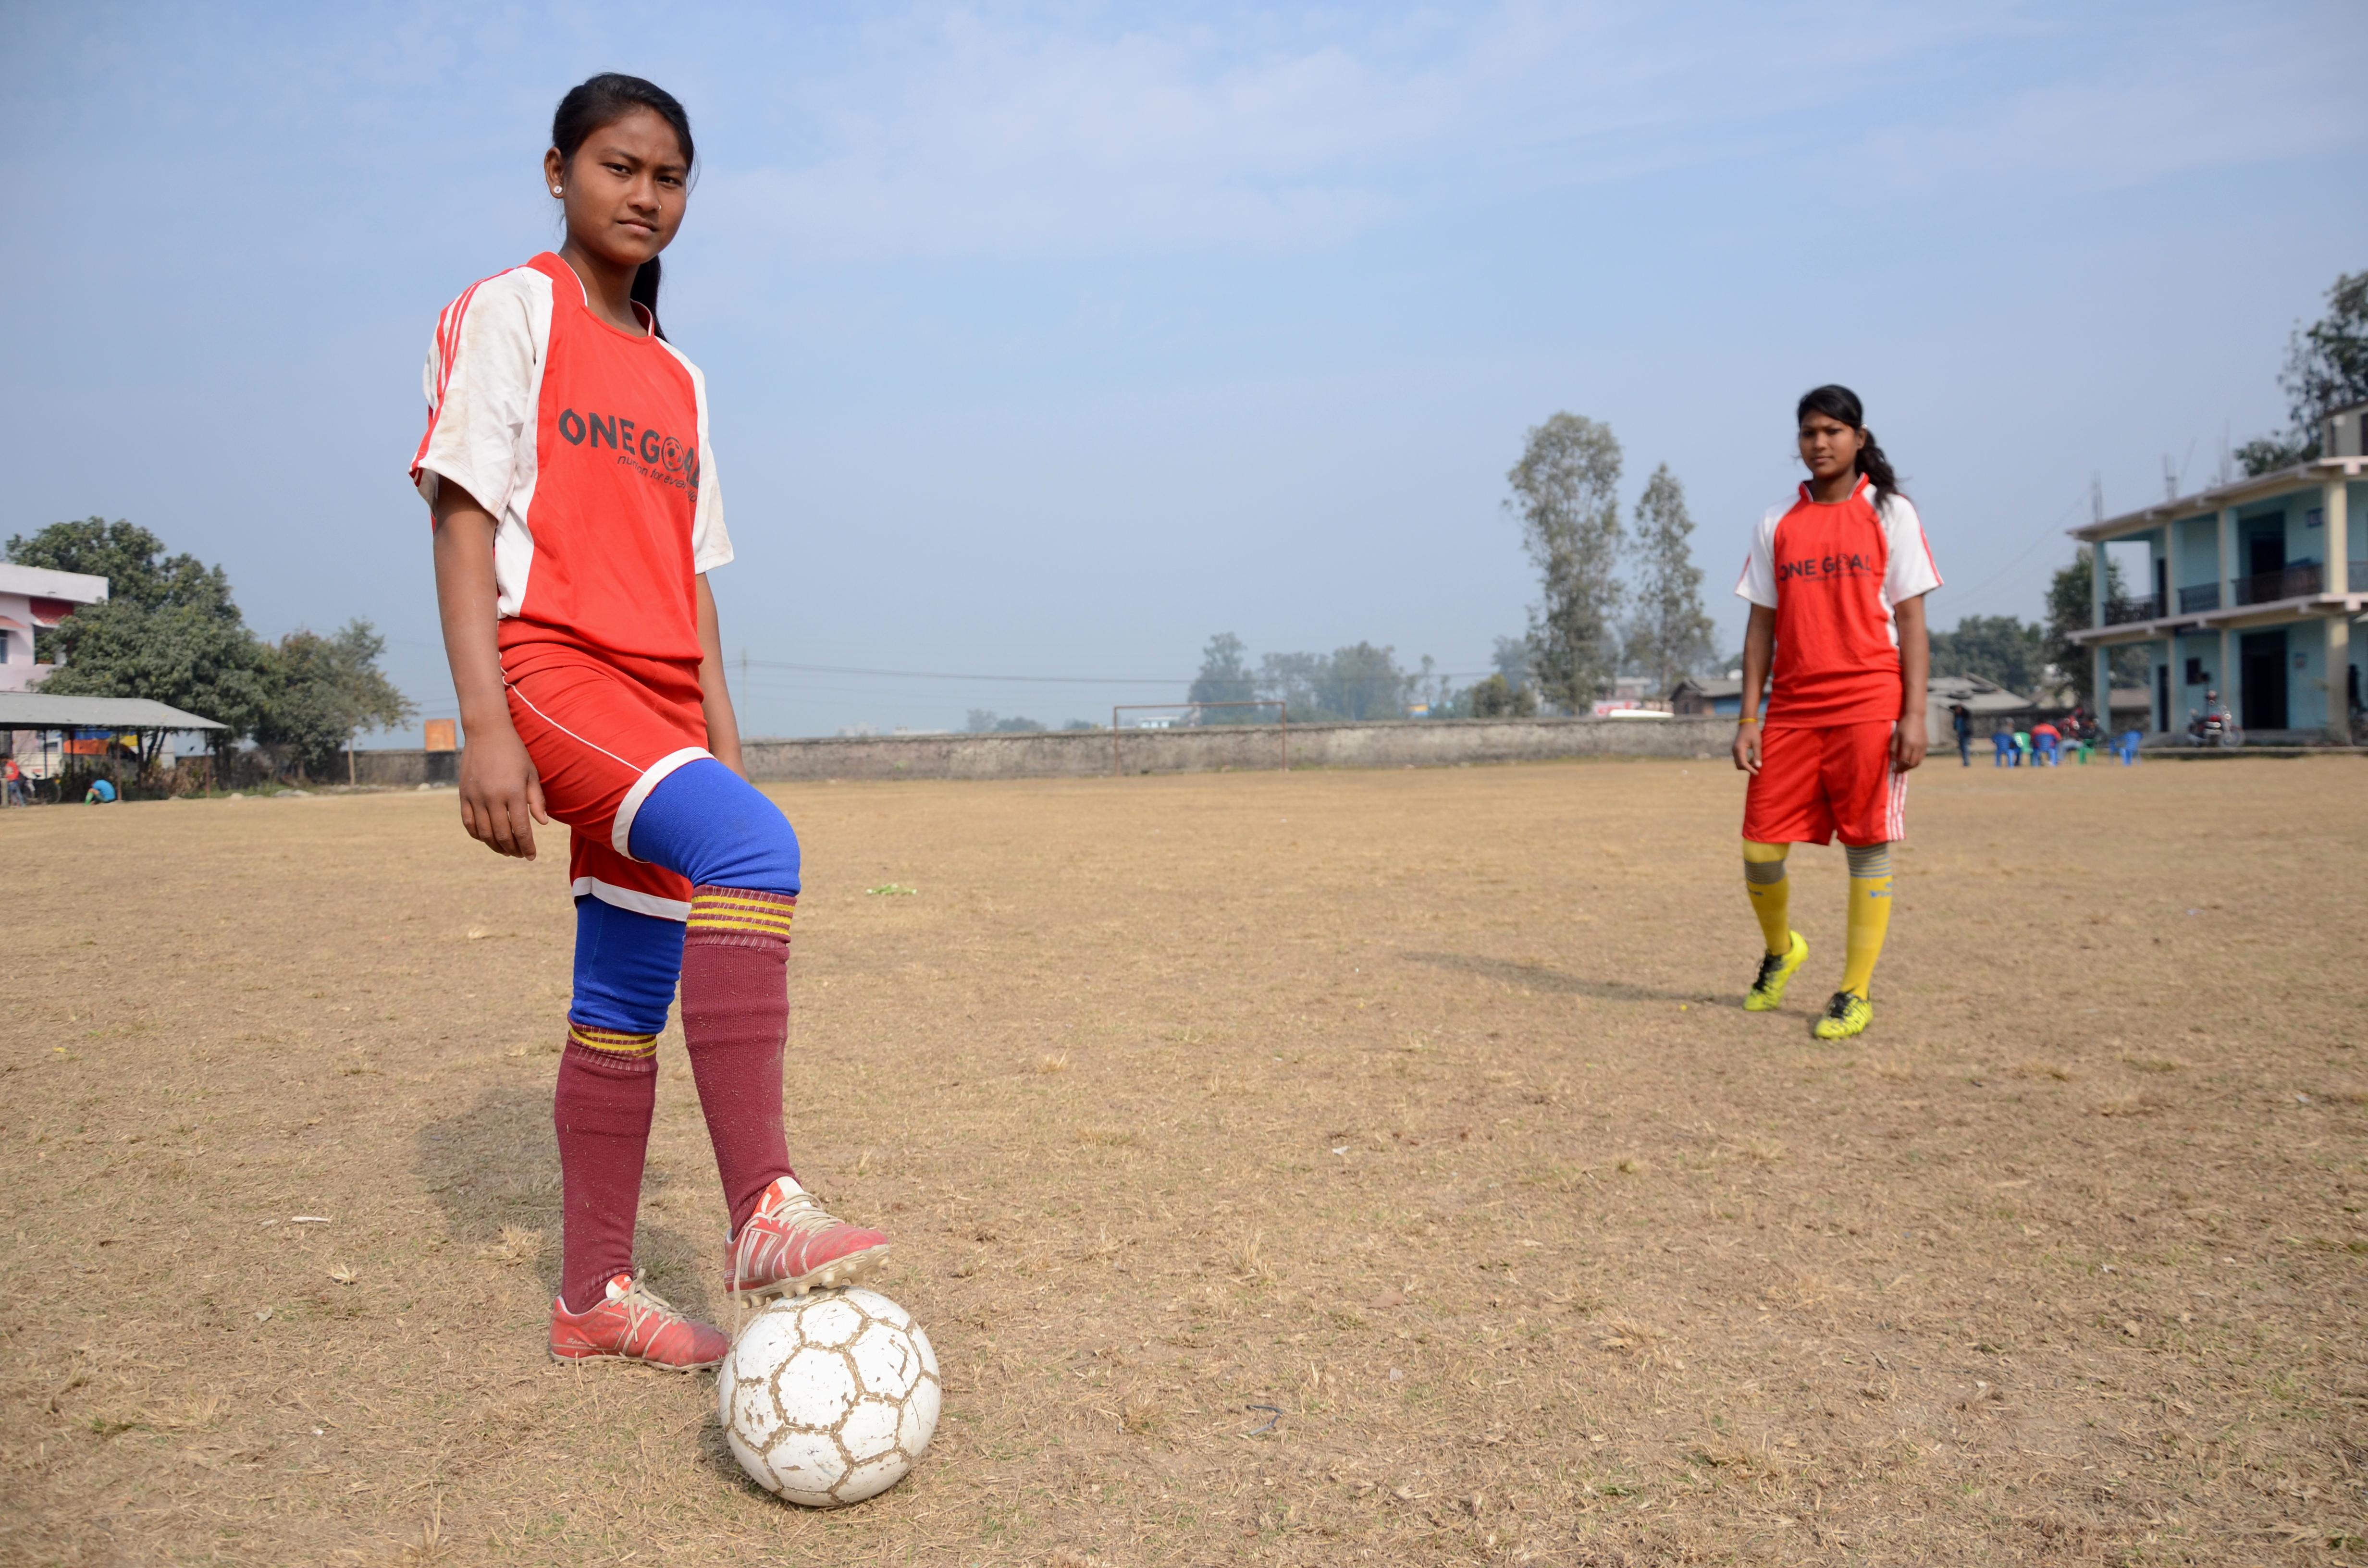 s151194_10_Sumina_Nepal_SKunwar_(32)_720423.JPG